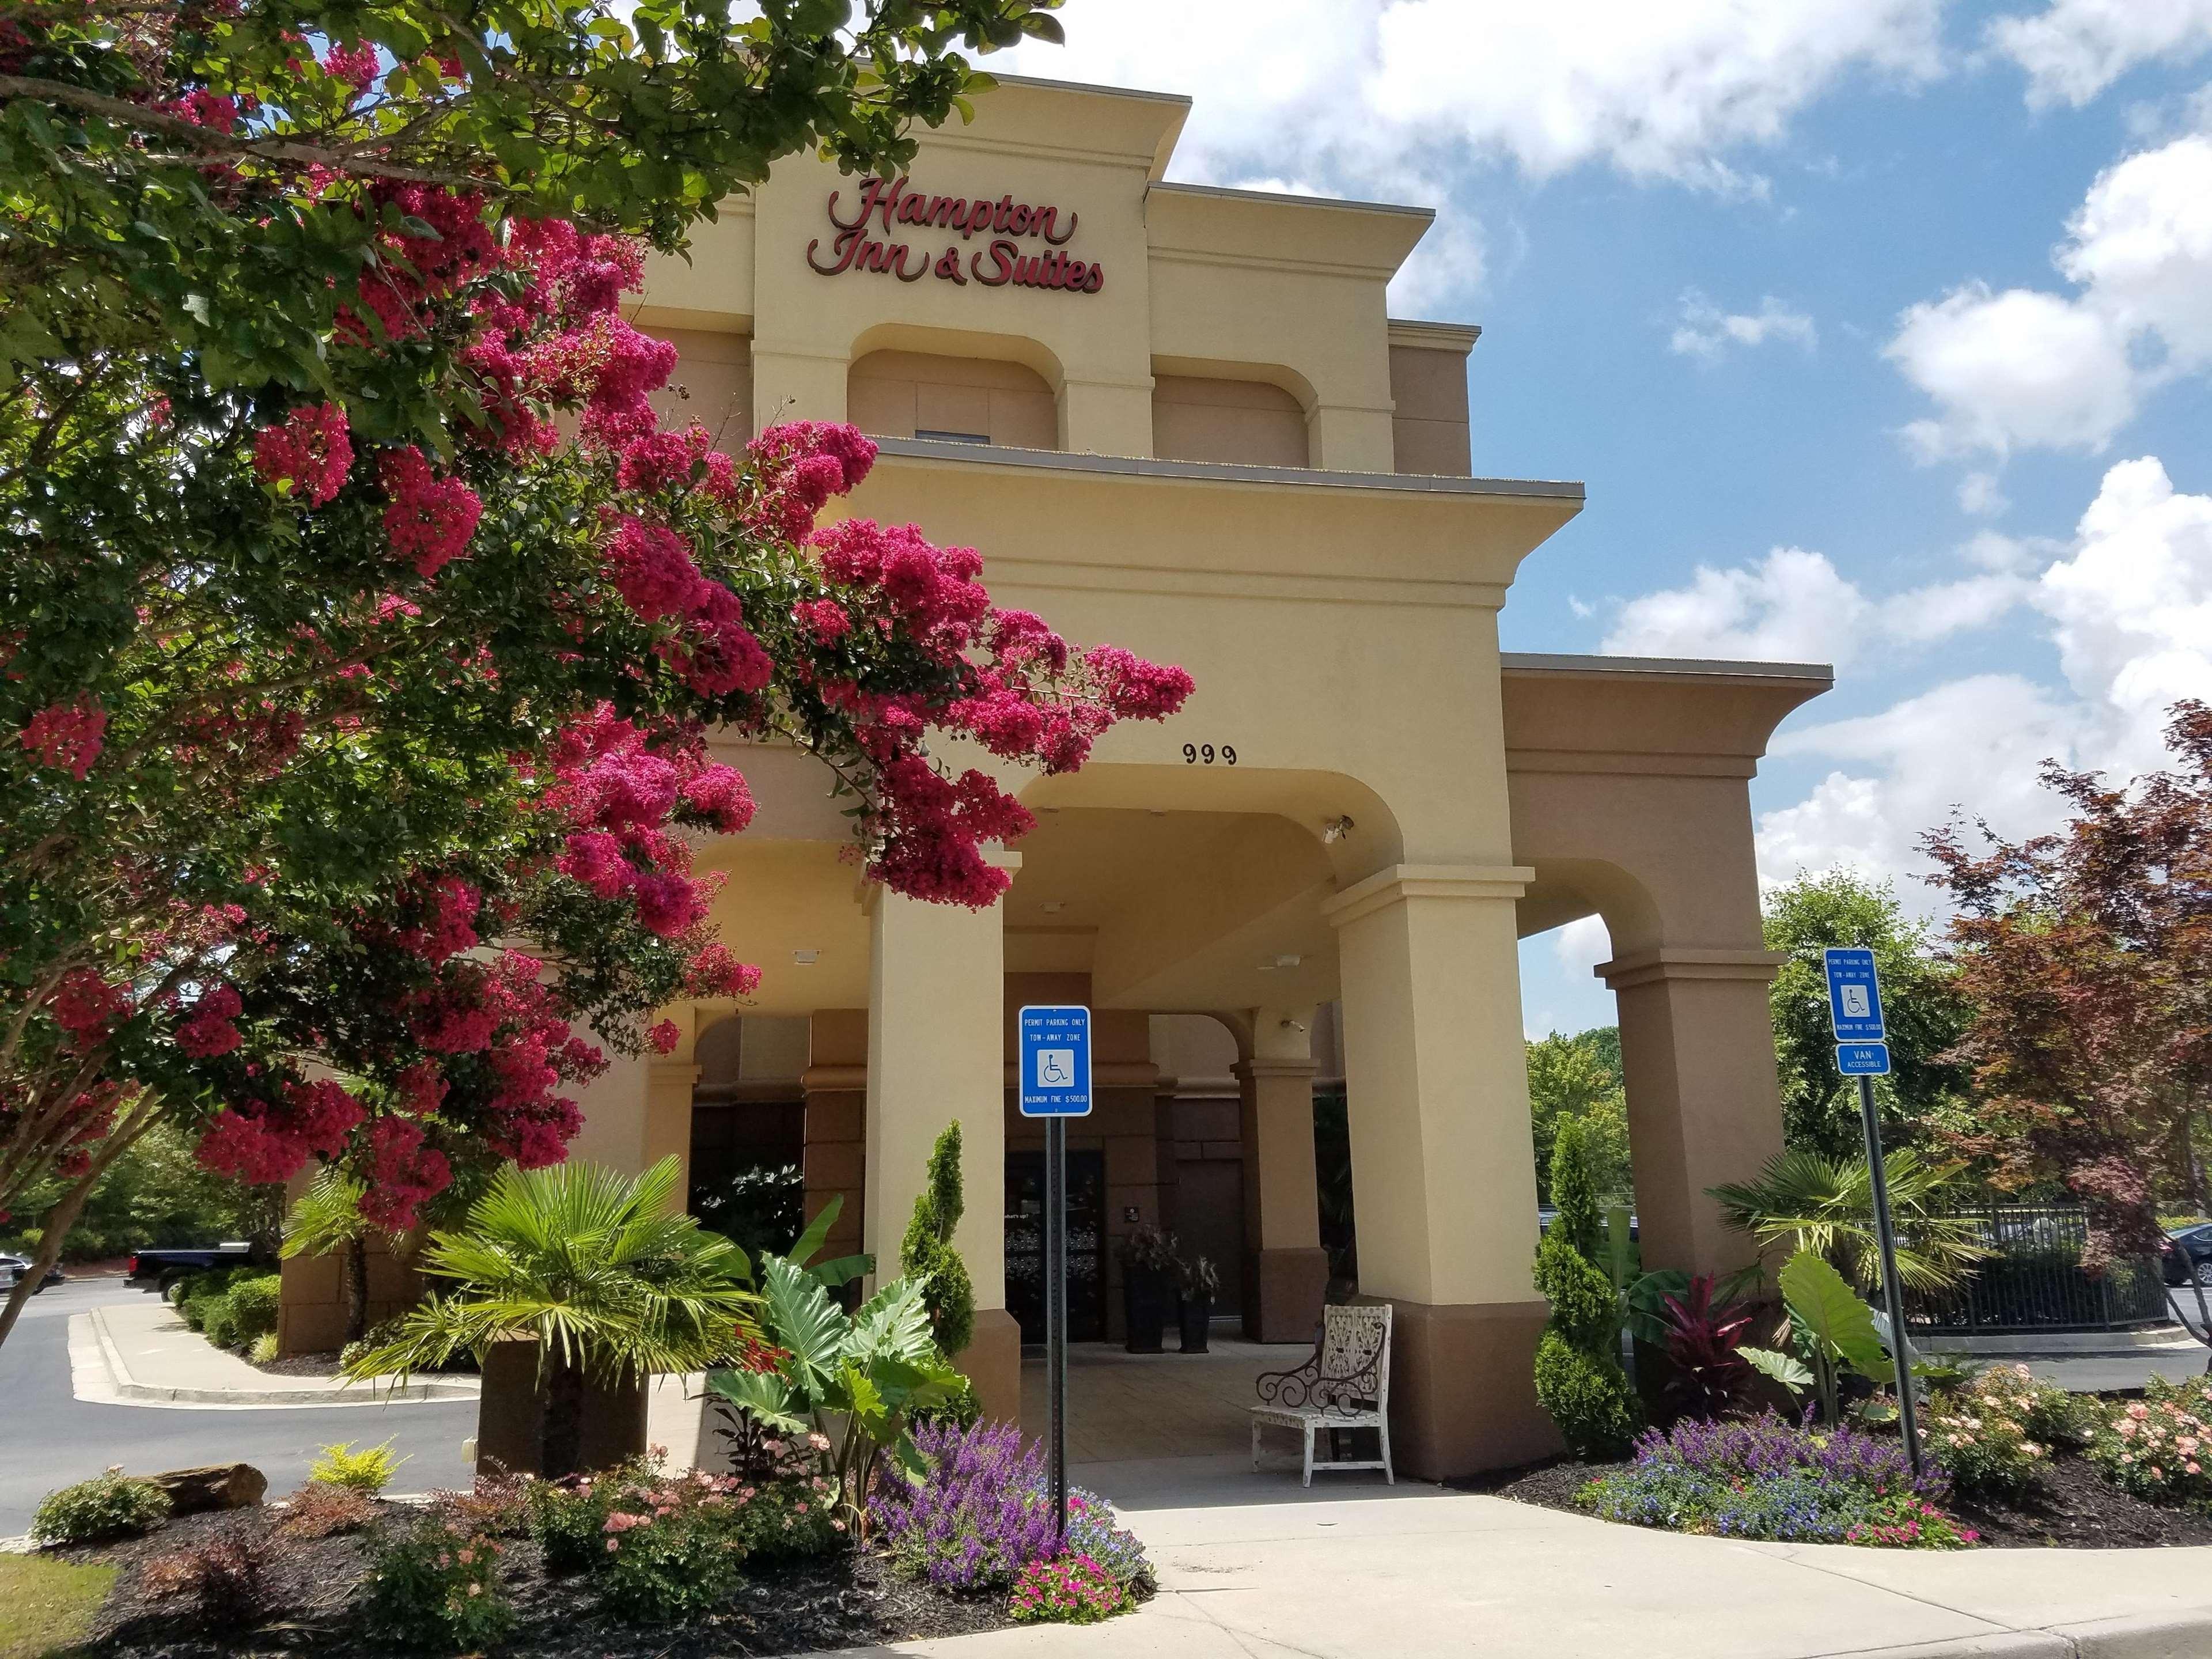 Hampton Inn & Suites ATL-Six Flags image 30